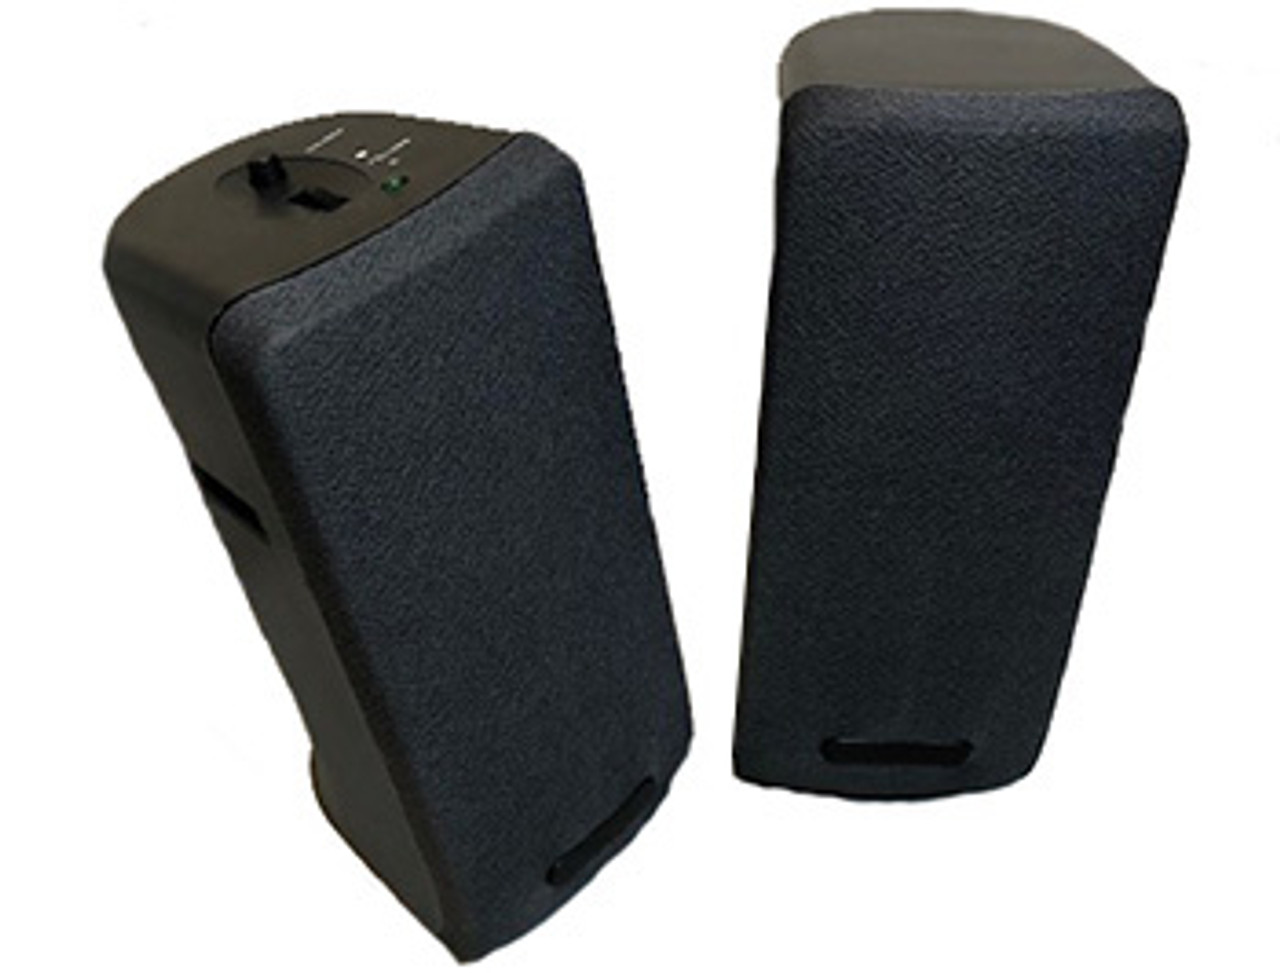 West Mountain Radio COMspkr Computer Speaker System